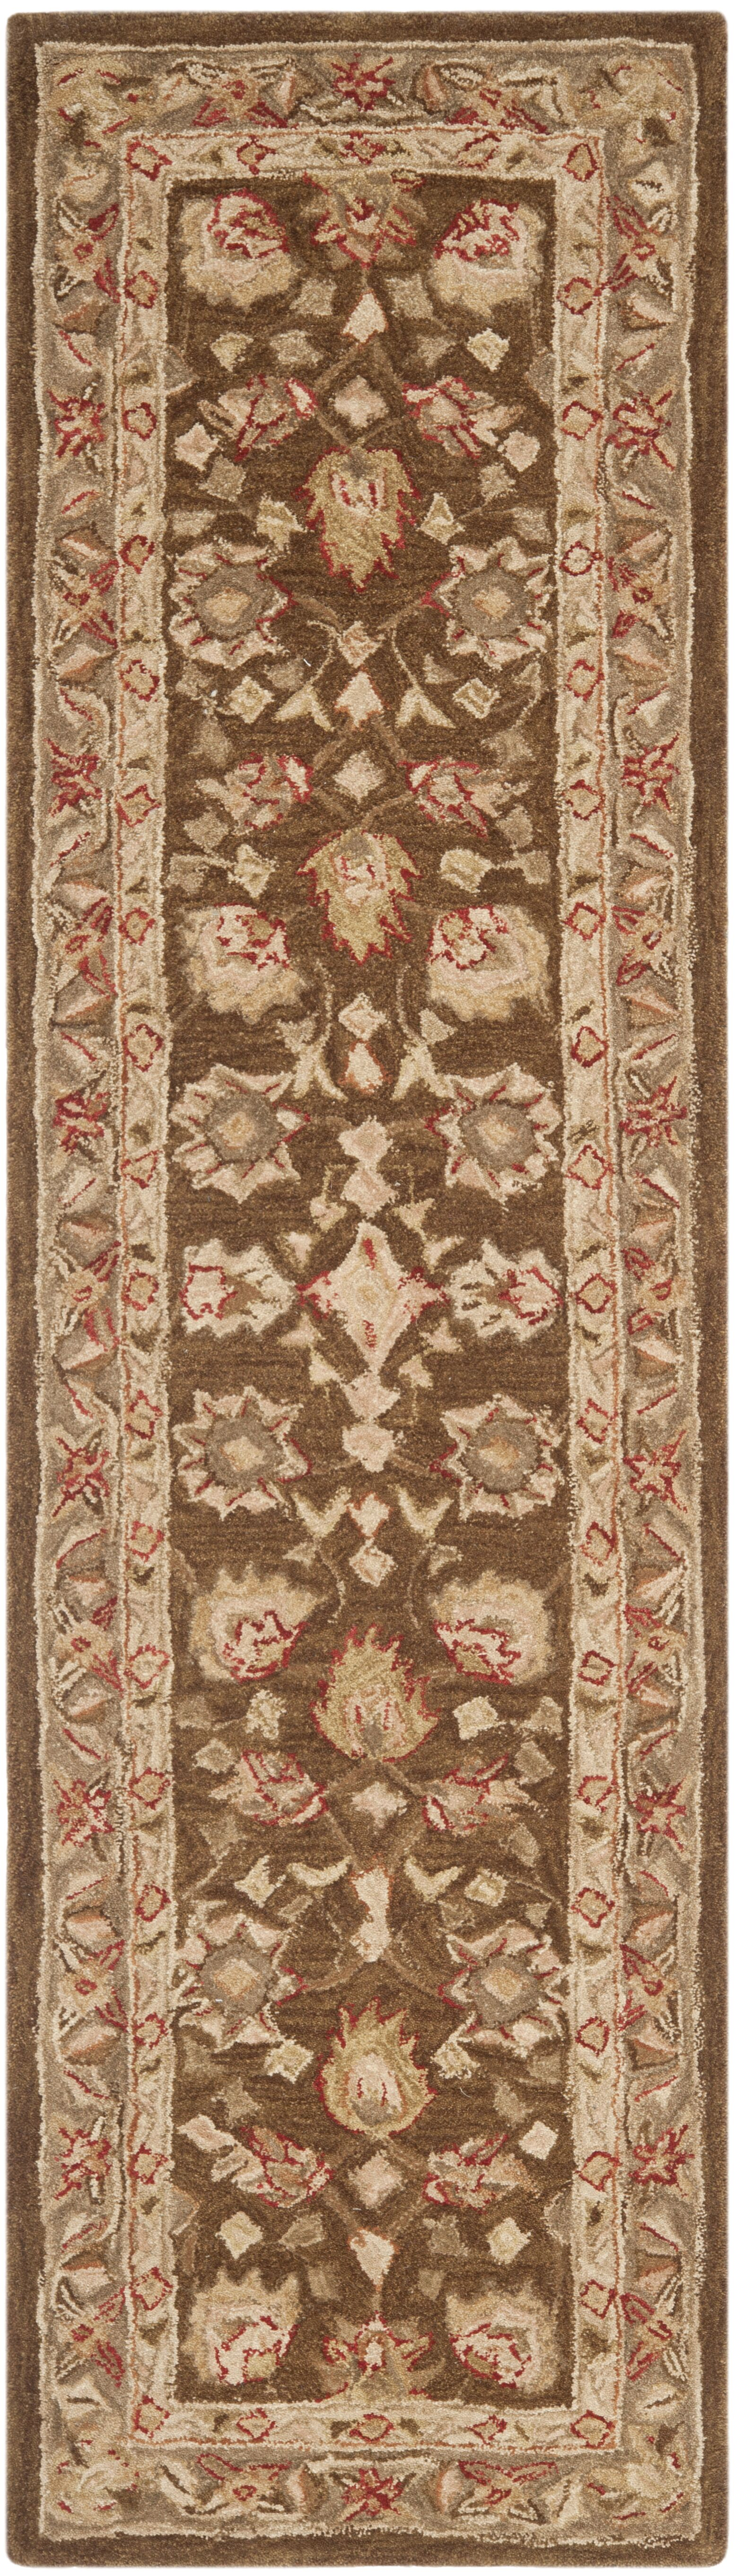 Anatolia Brown/Green Area Rug Rug Size: Rectangle 9' x 12'